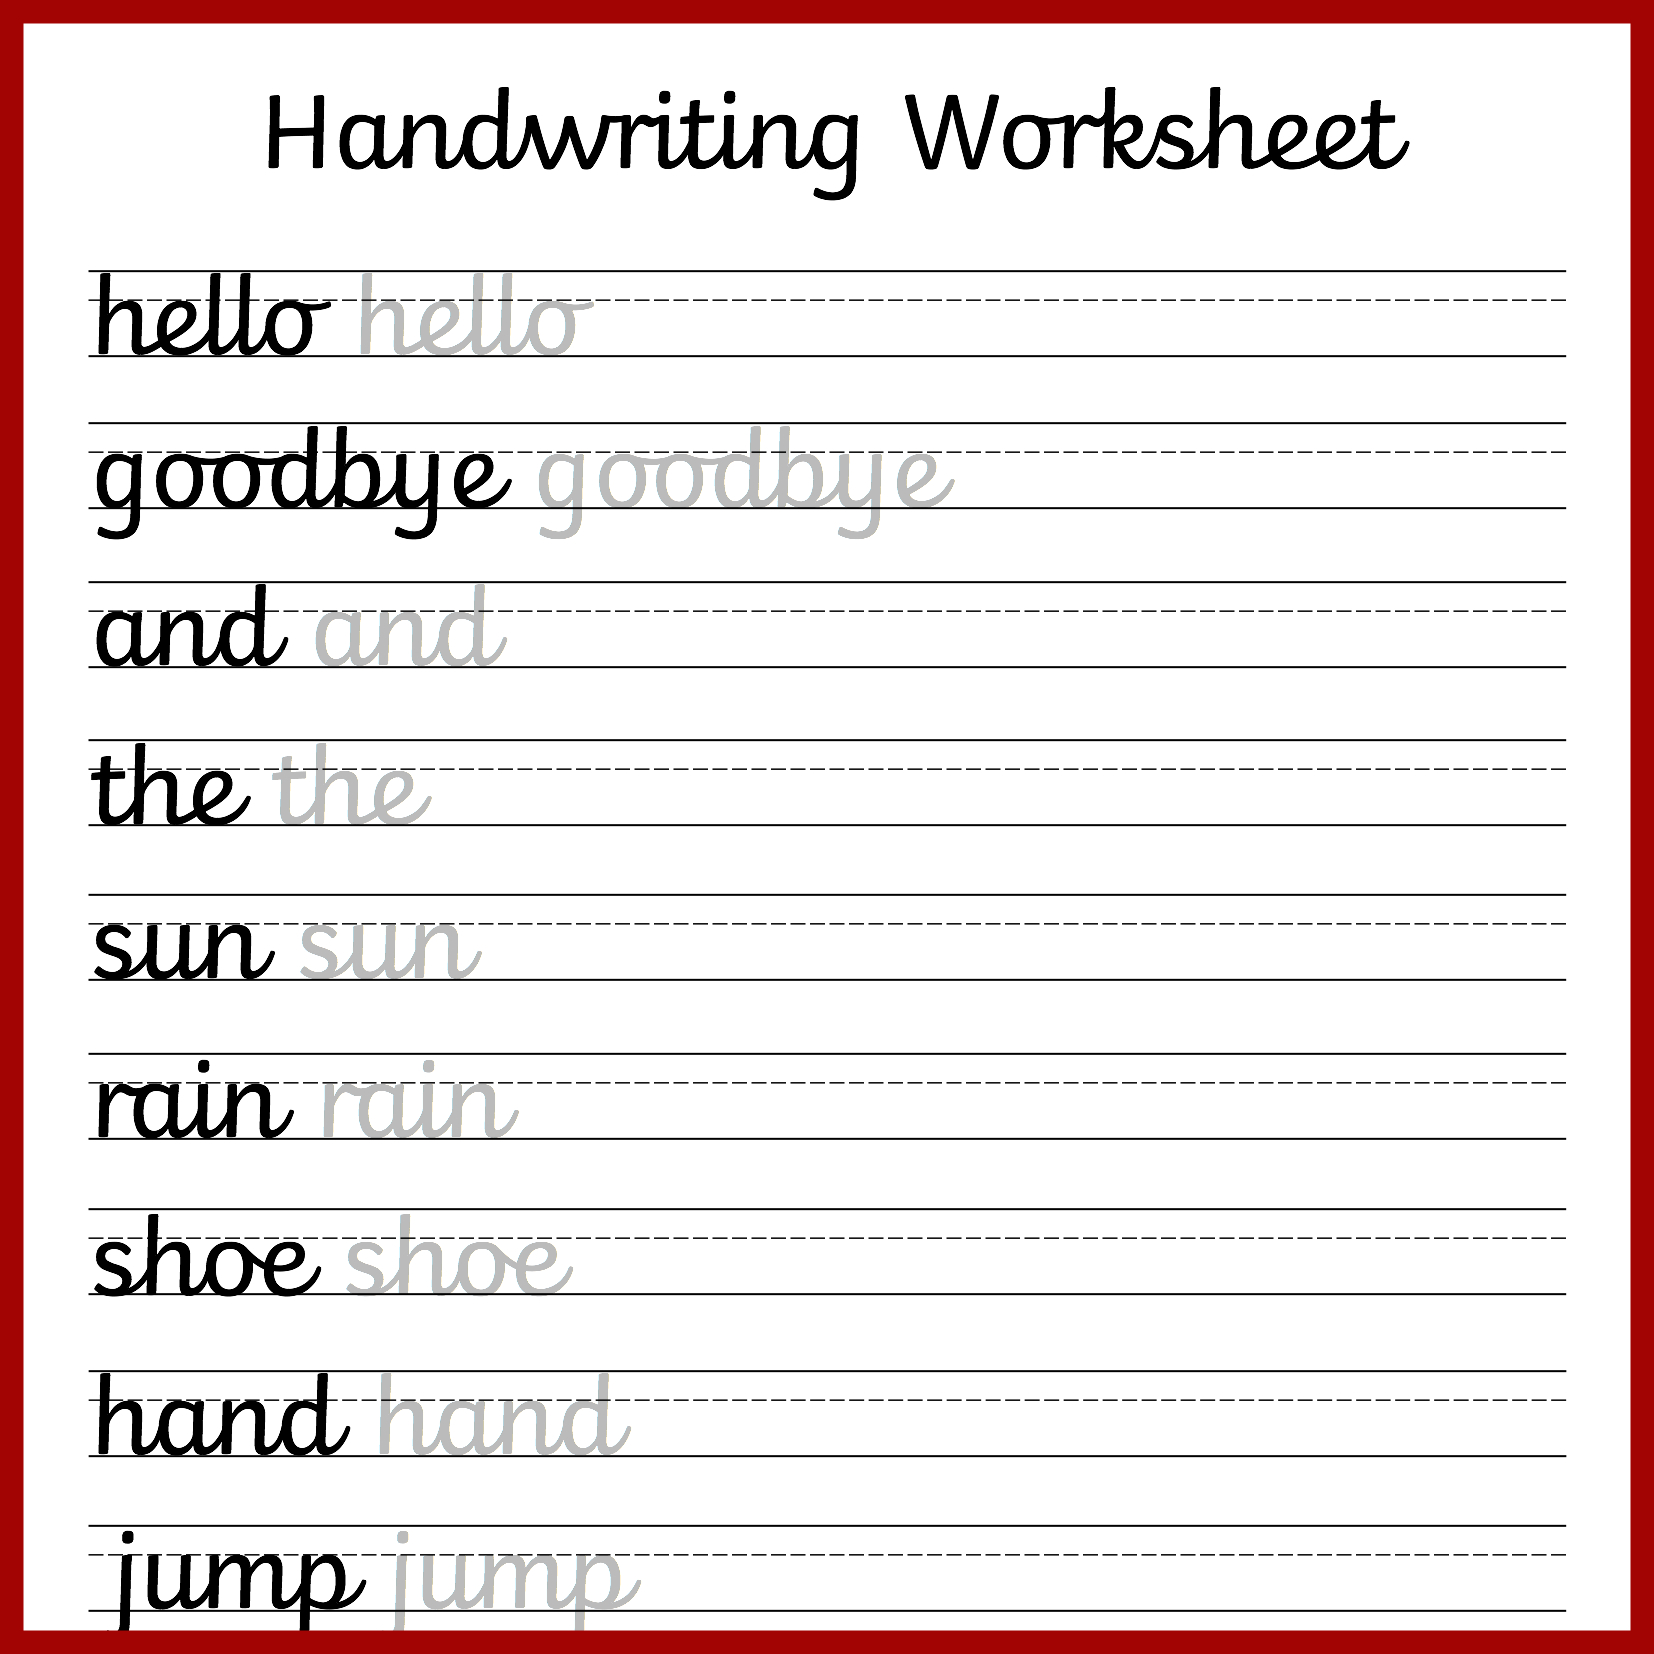 Cursive Handwriting Worksheets – Free Printable! ⋆ Mama Geek - Free Printable Handwriting Worksheets